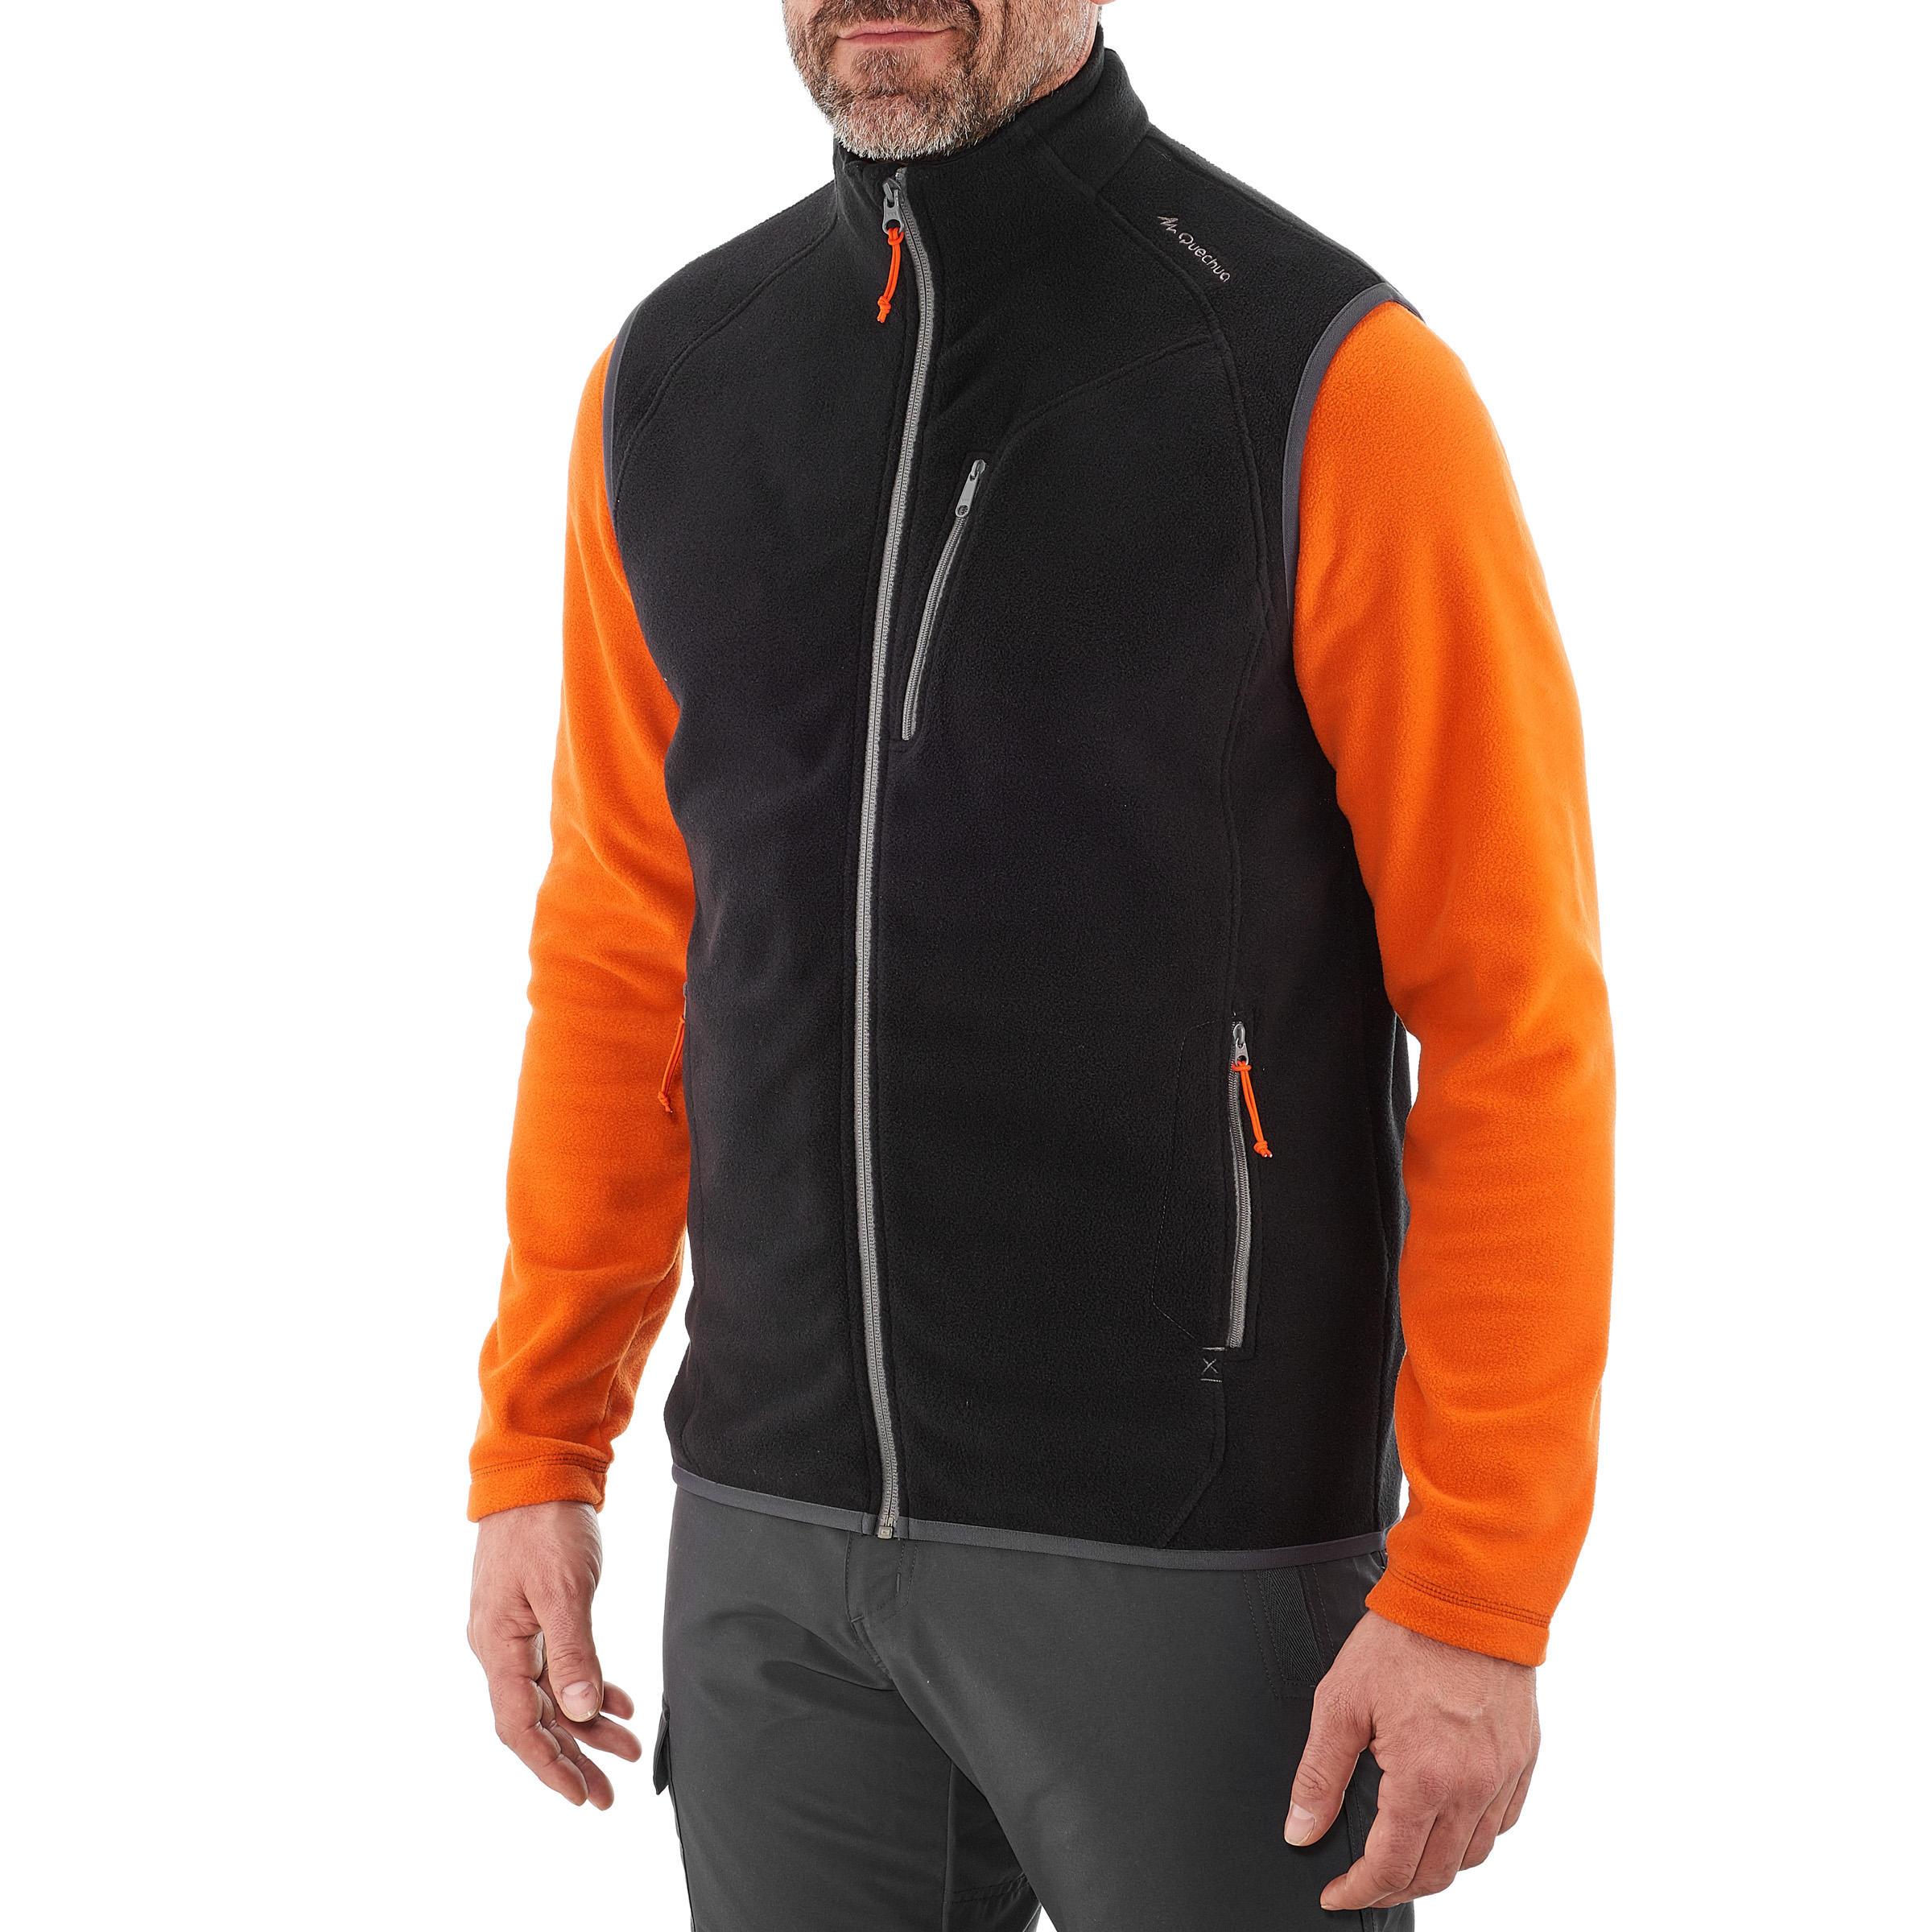 MH120 Men's Mountain Hiking Fleece Gilet - Black